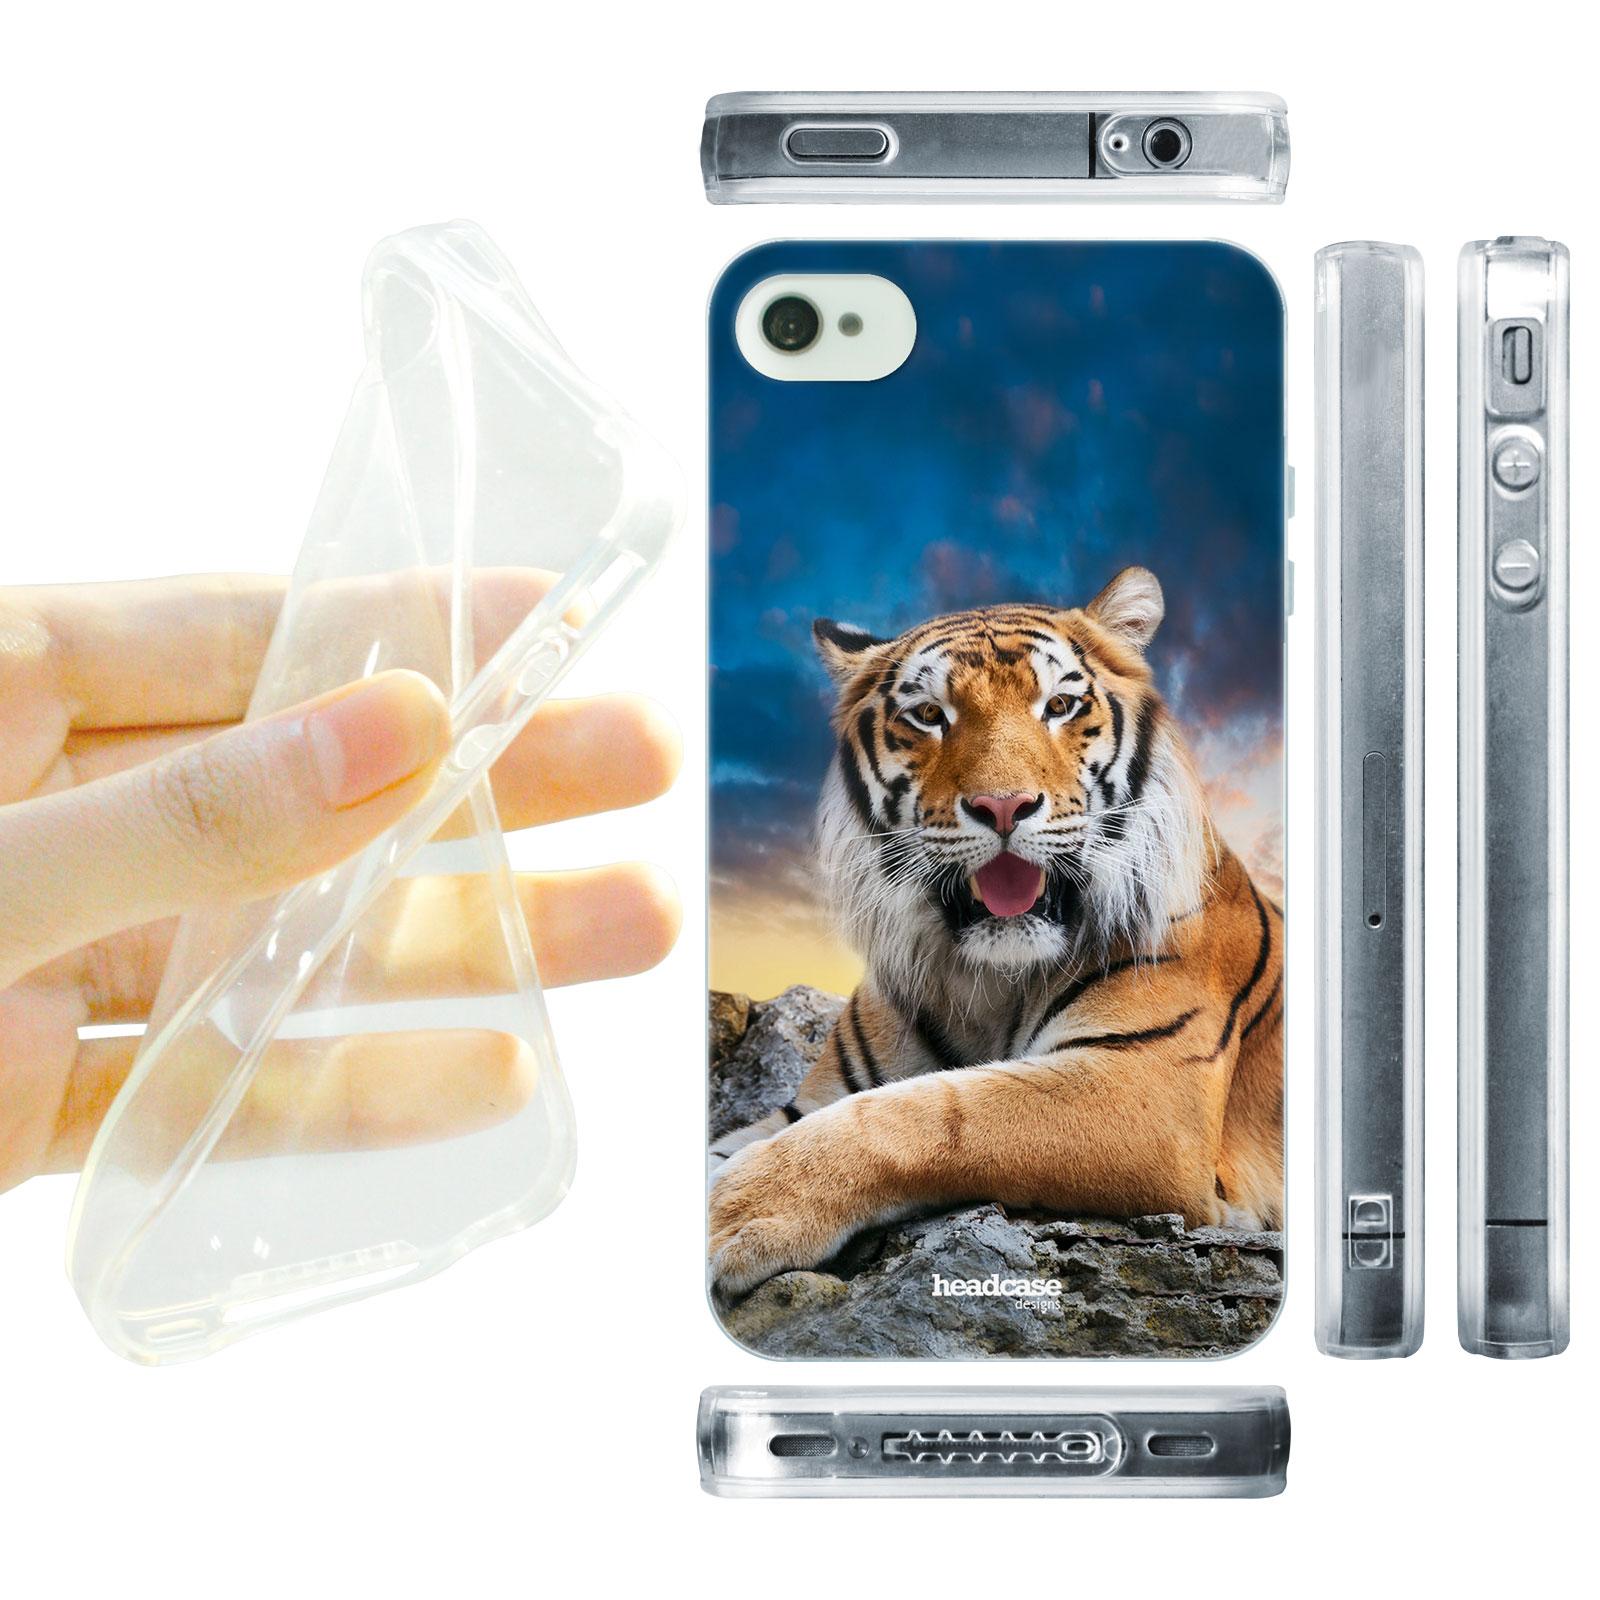 HEAD CASE silikonový obal na mobil Iphone 4/4S divočina tygr bengálský portrét foto